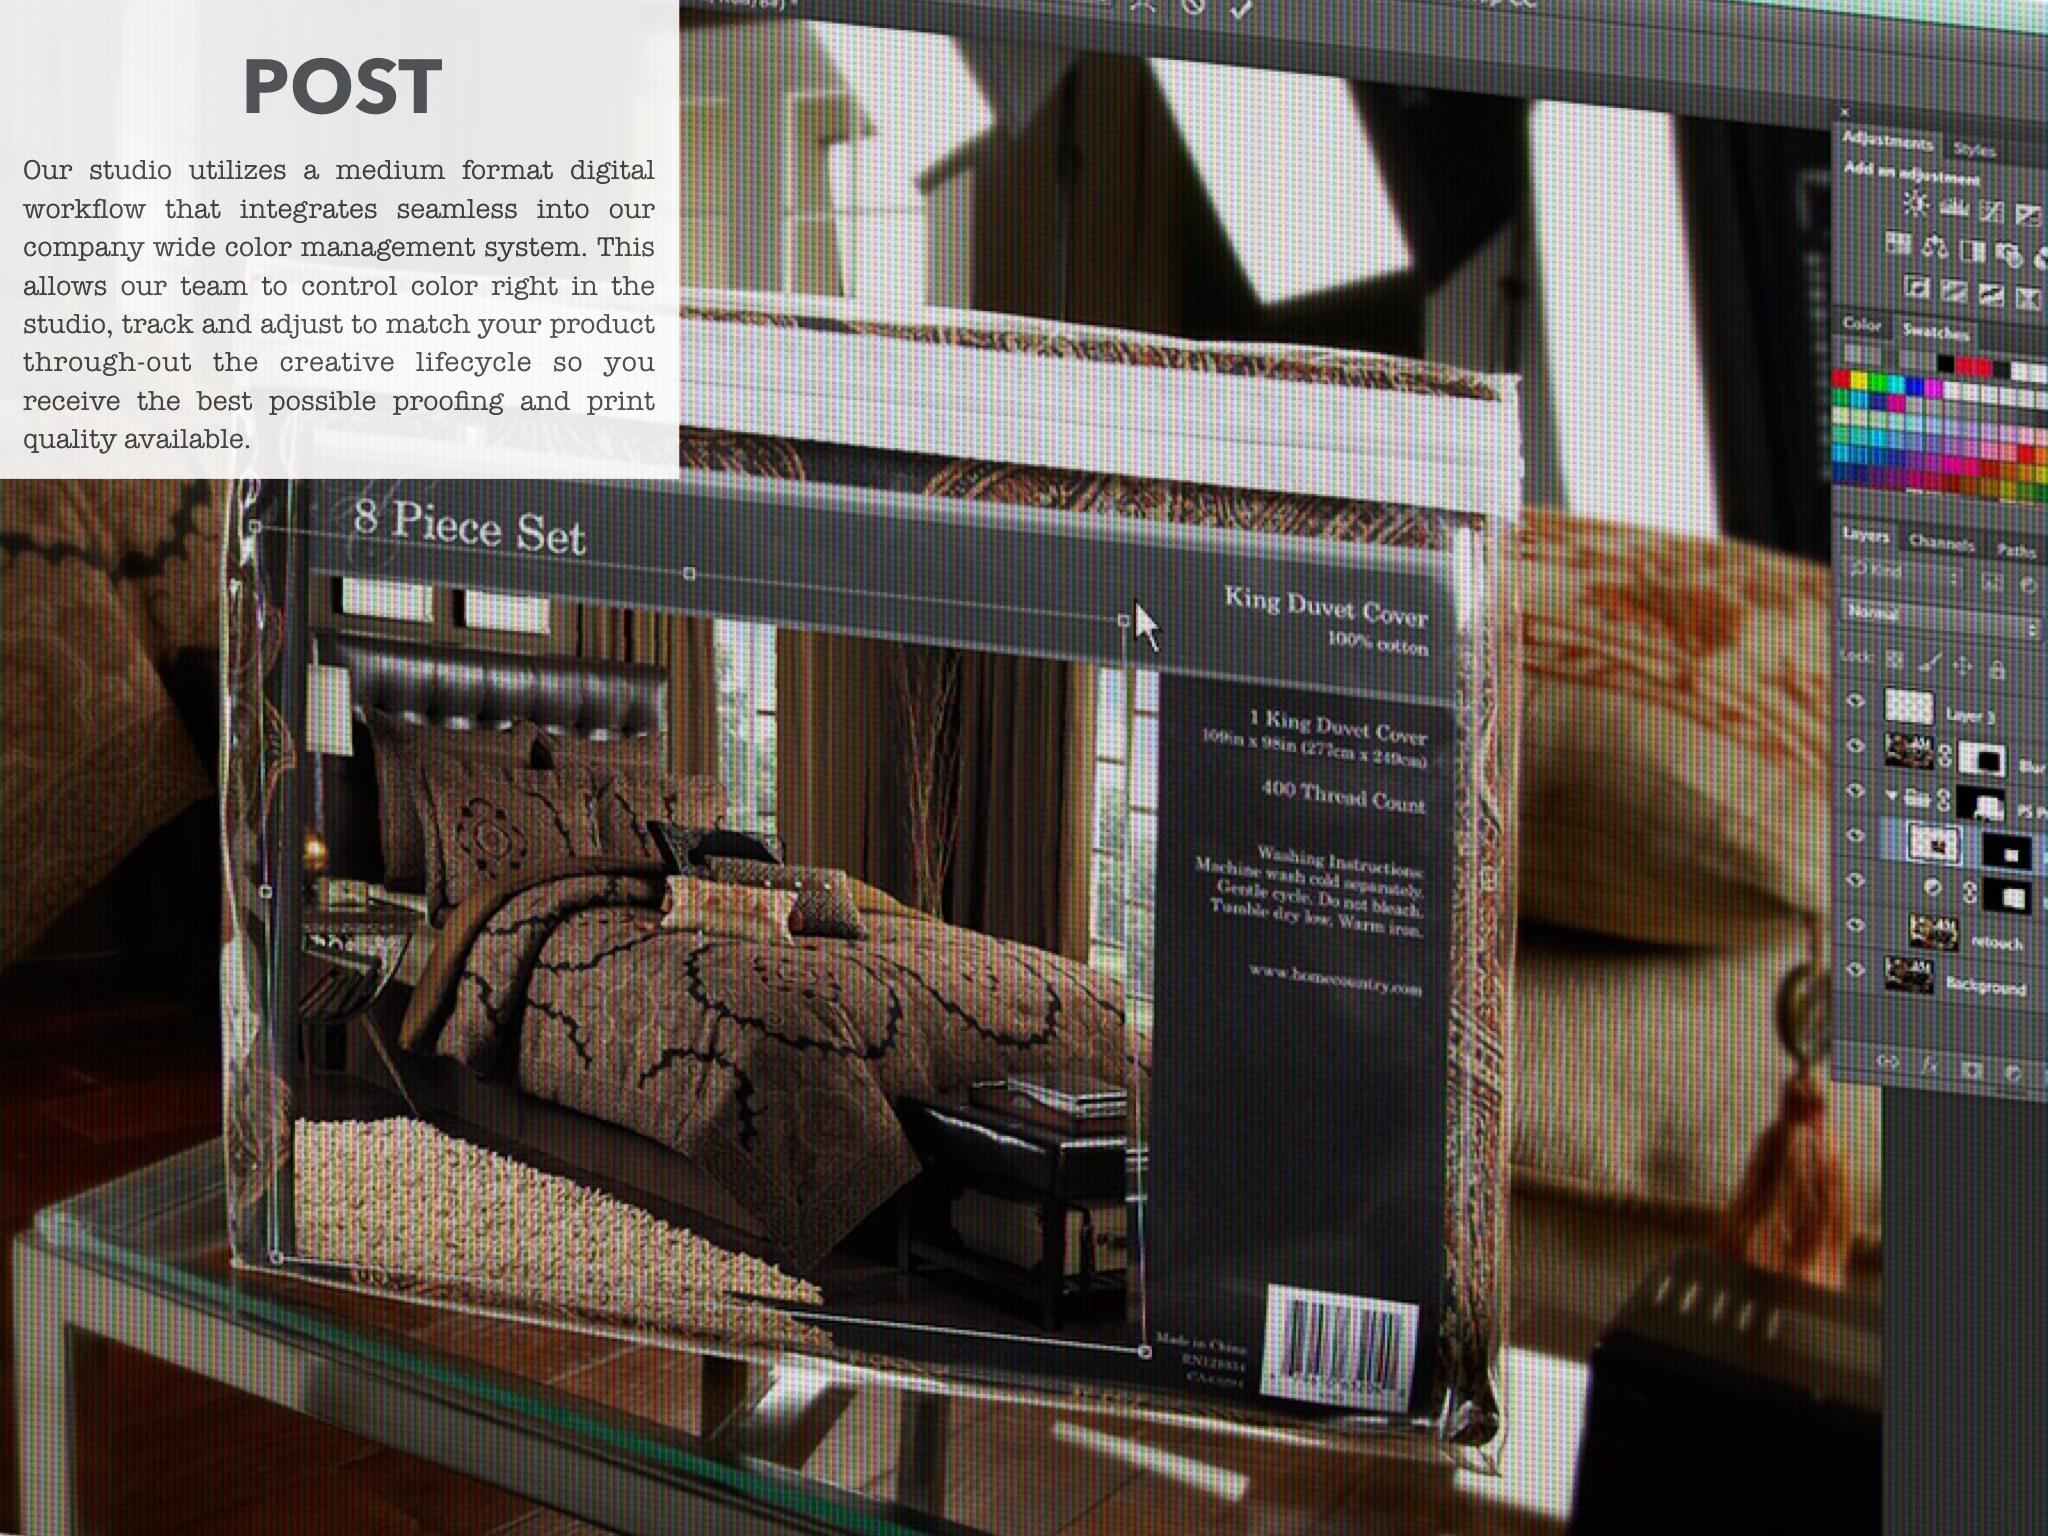 wsp-wprint-presentation-jpg.006.jpeg